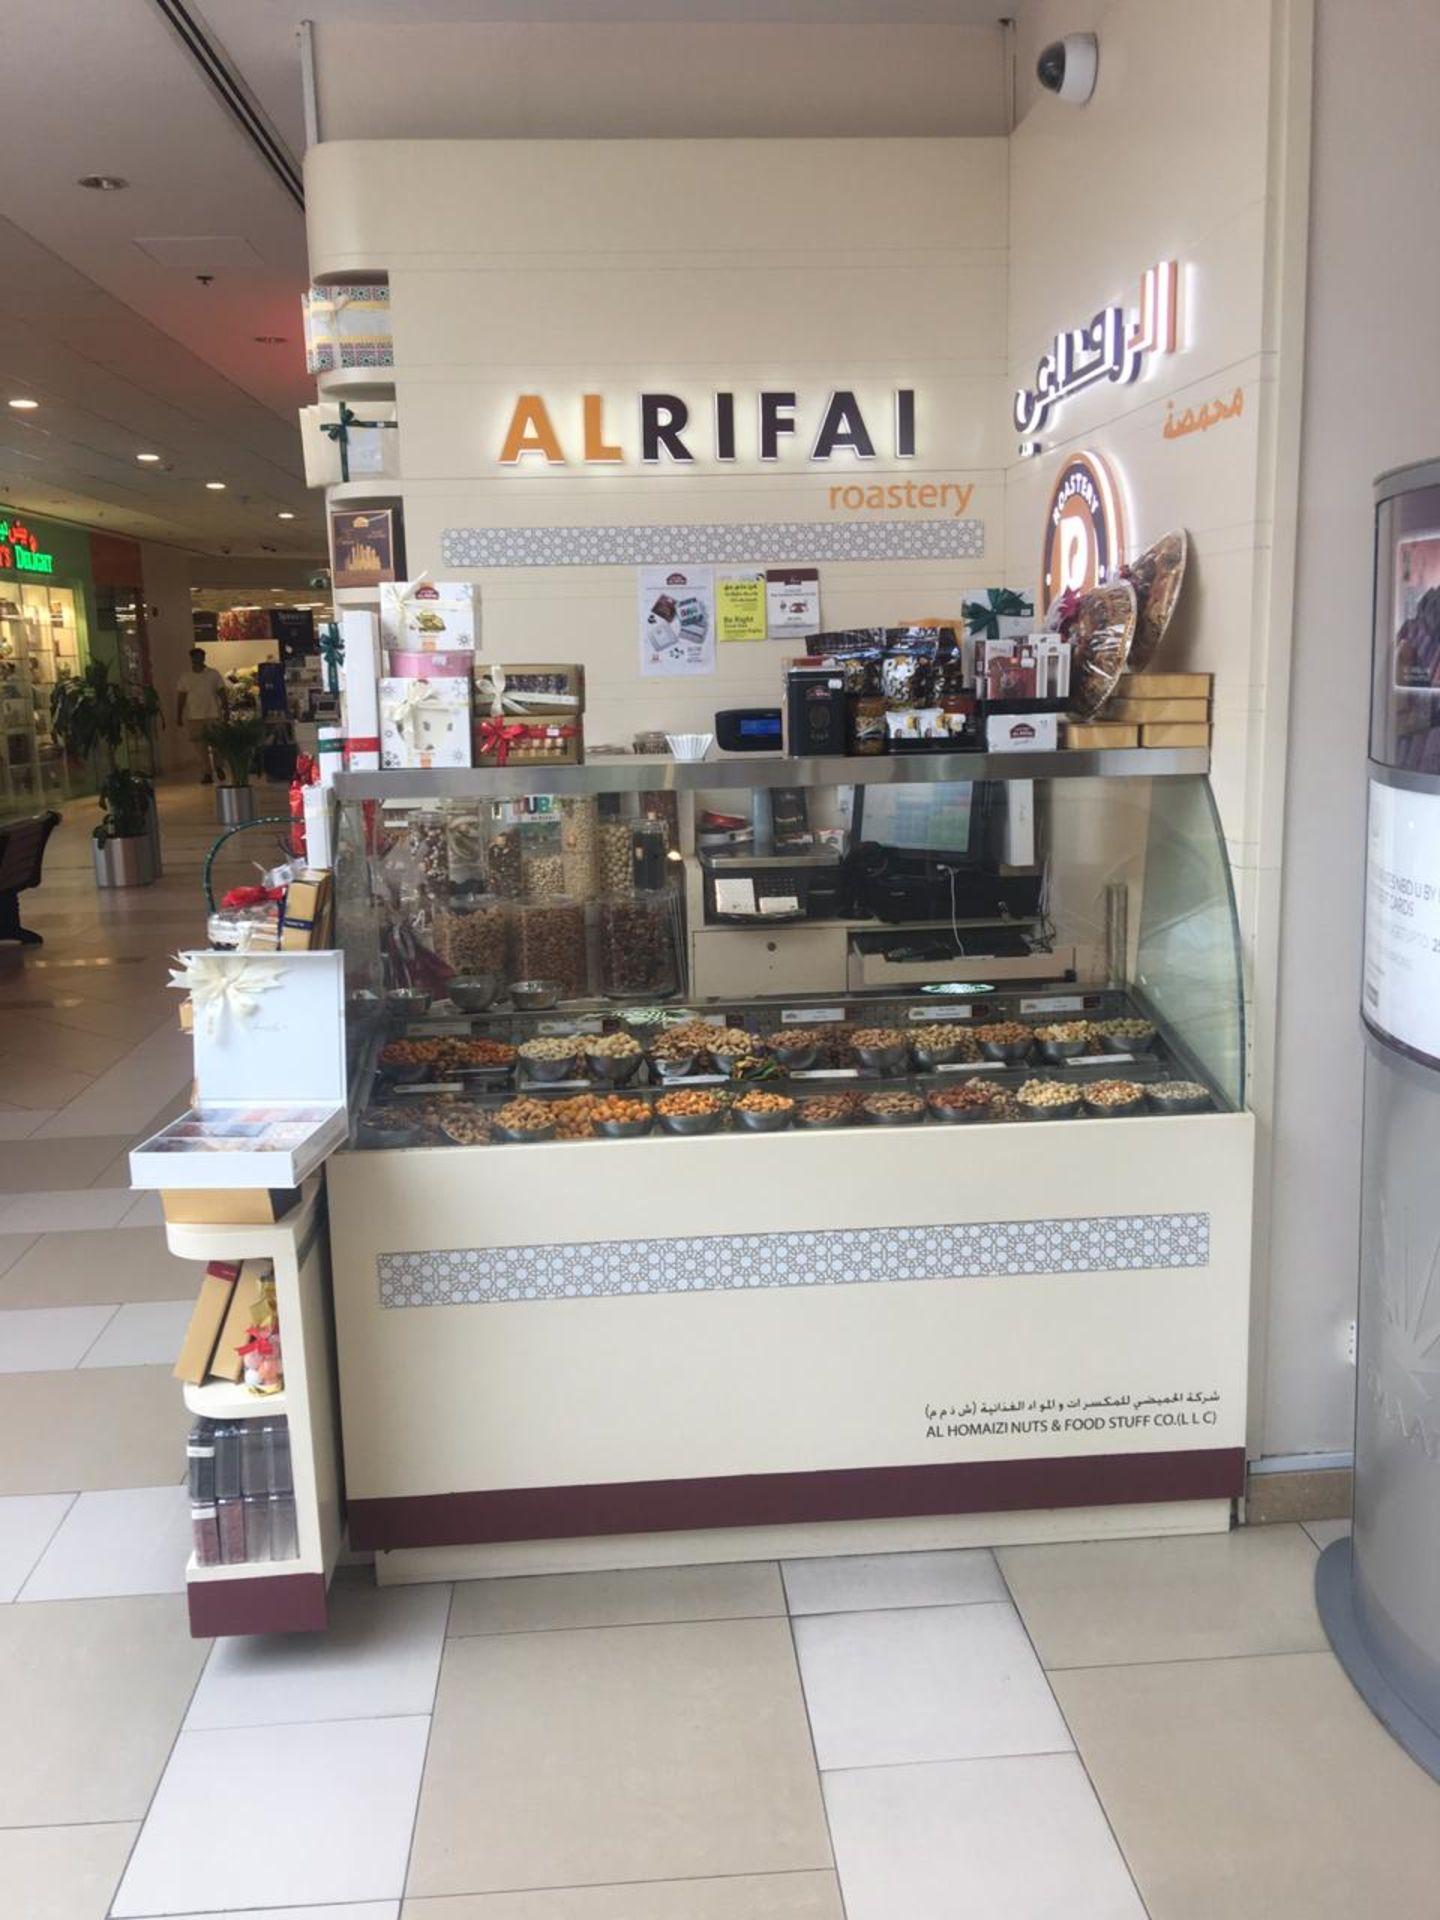 HiDubai-business-al-rifai-roastery-twc-food-beverage-bakeries-desserts-sweets-springs-al-thanyah-4-dubai